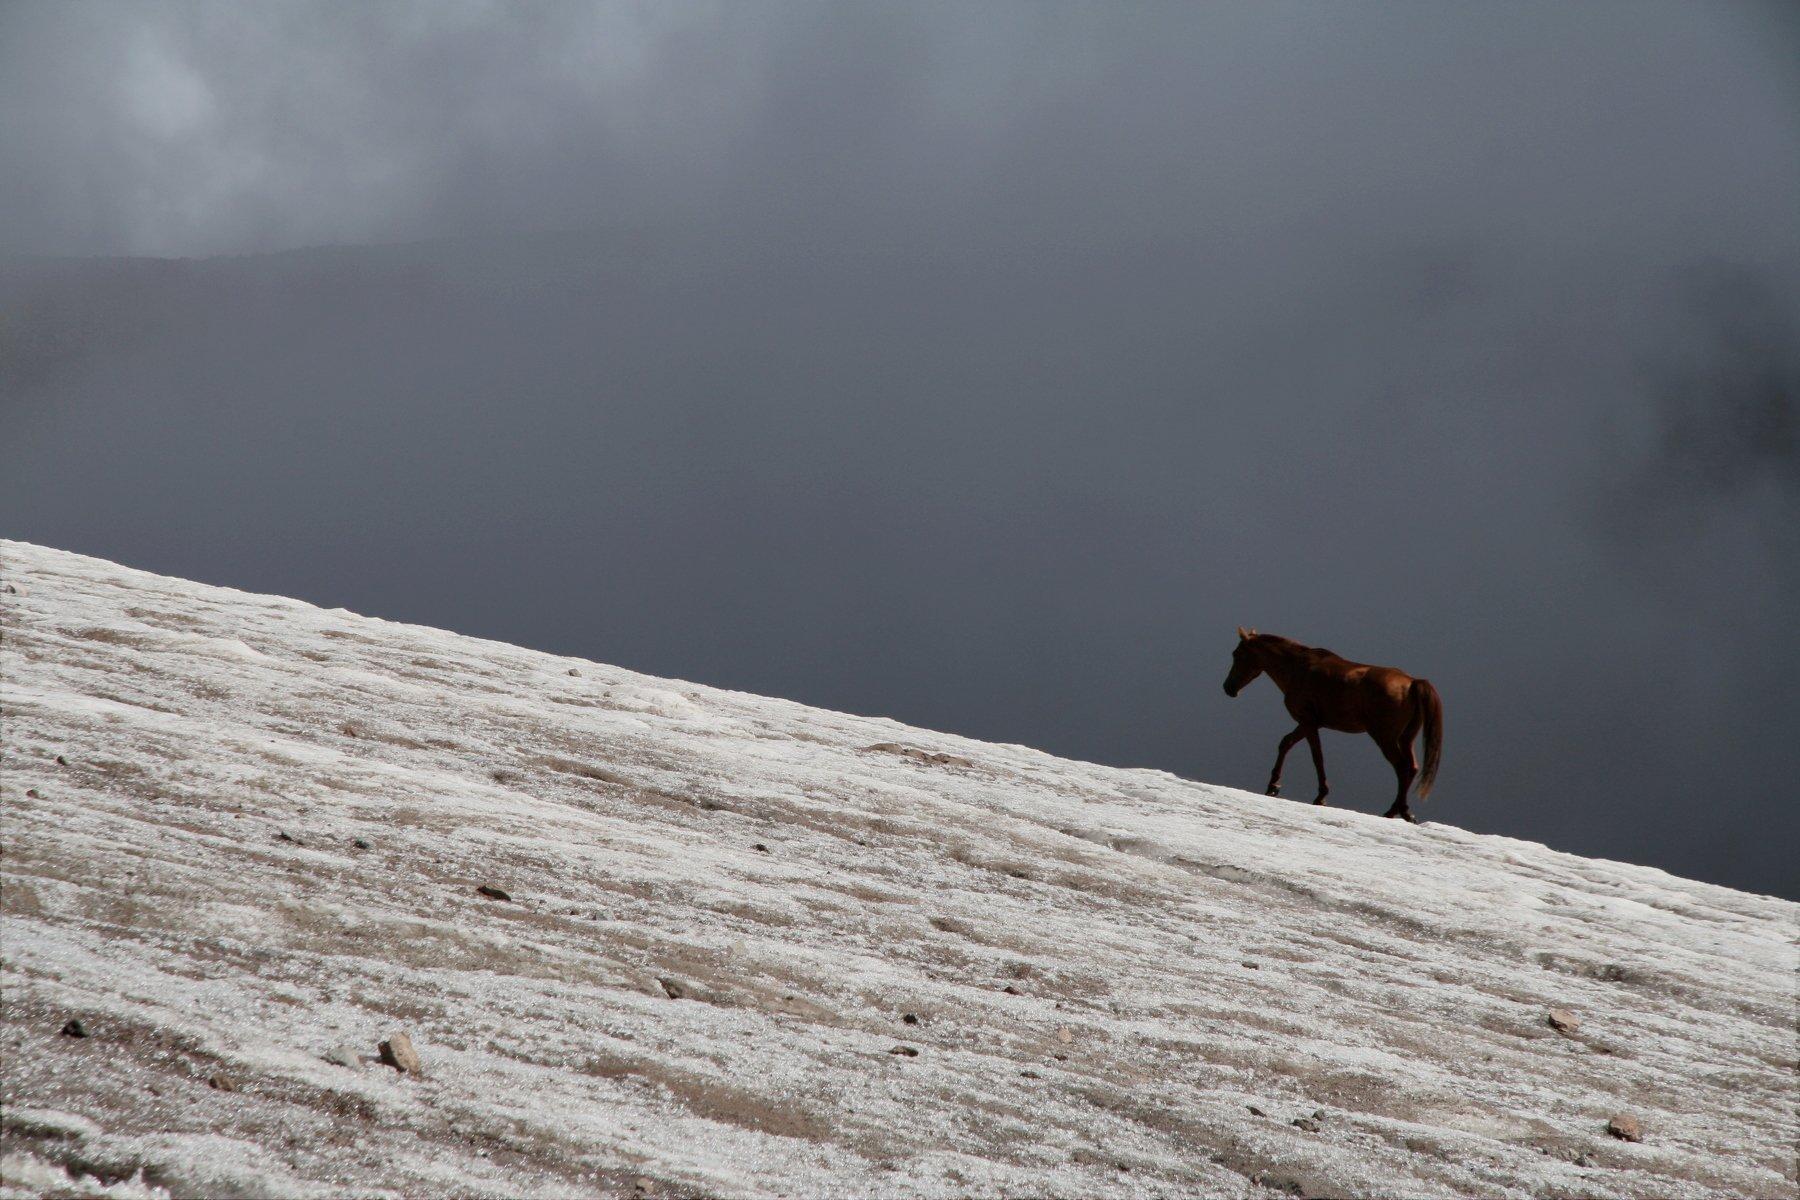 лошадь, ледник, горы, казбек, грузия, horse, glacier, mountains, kazbek, georgia, альпинизм, mountaineering, Serg Pechenizhskiy